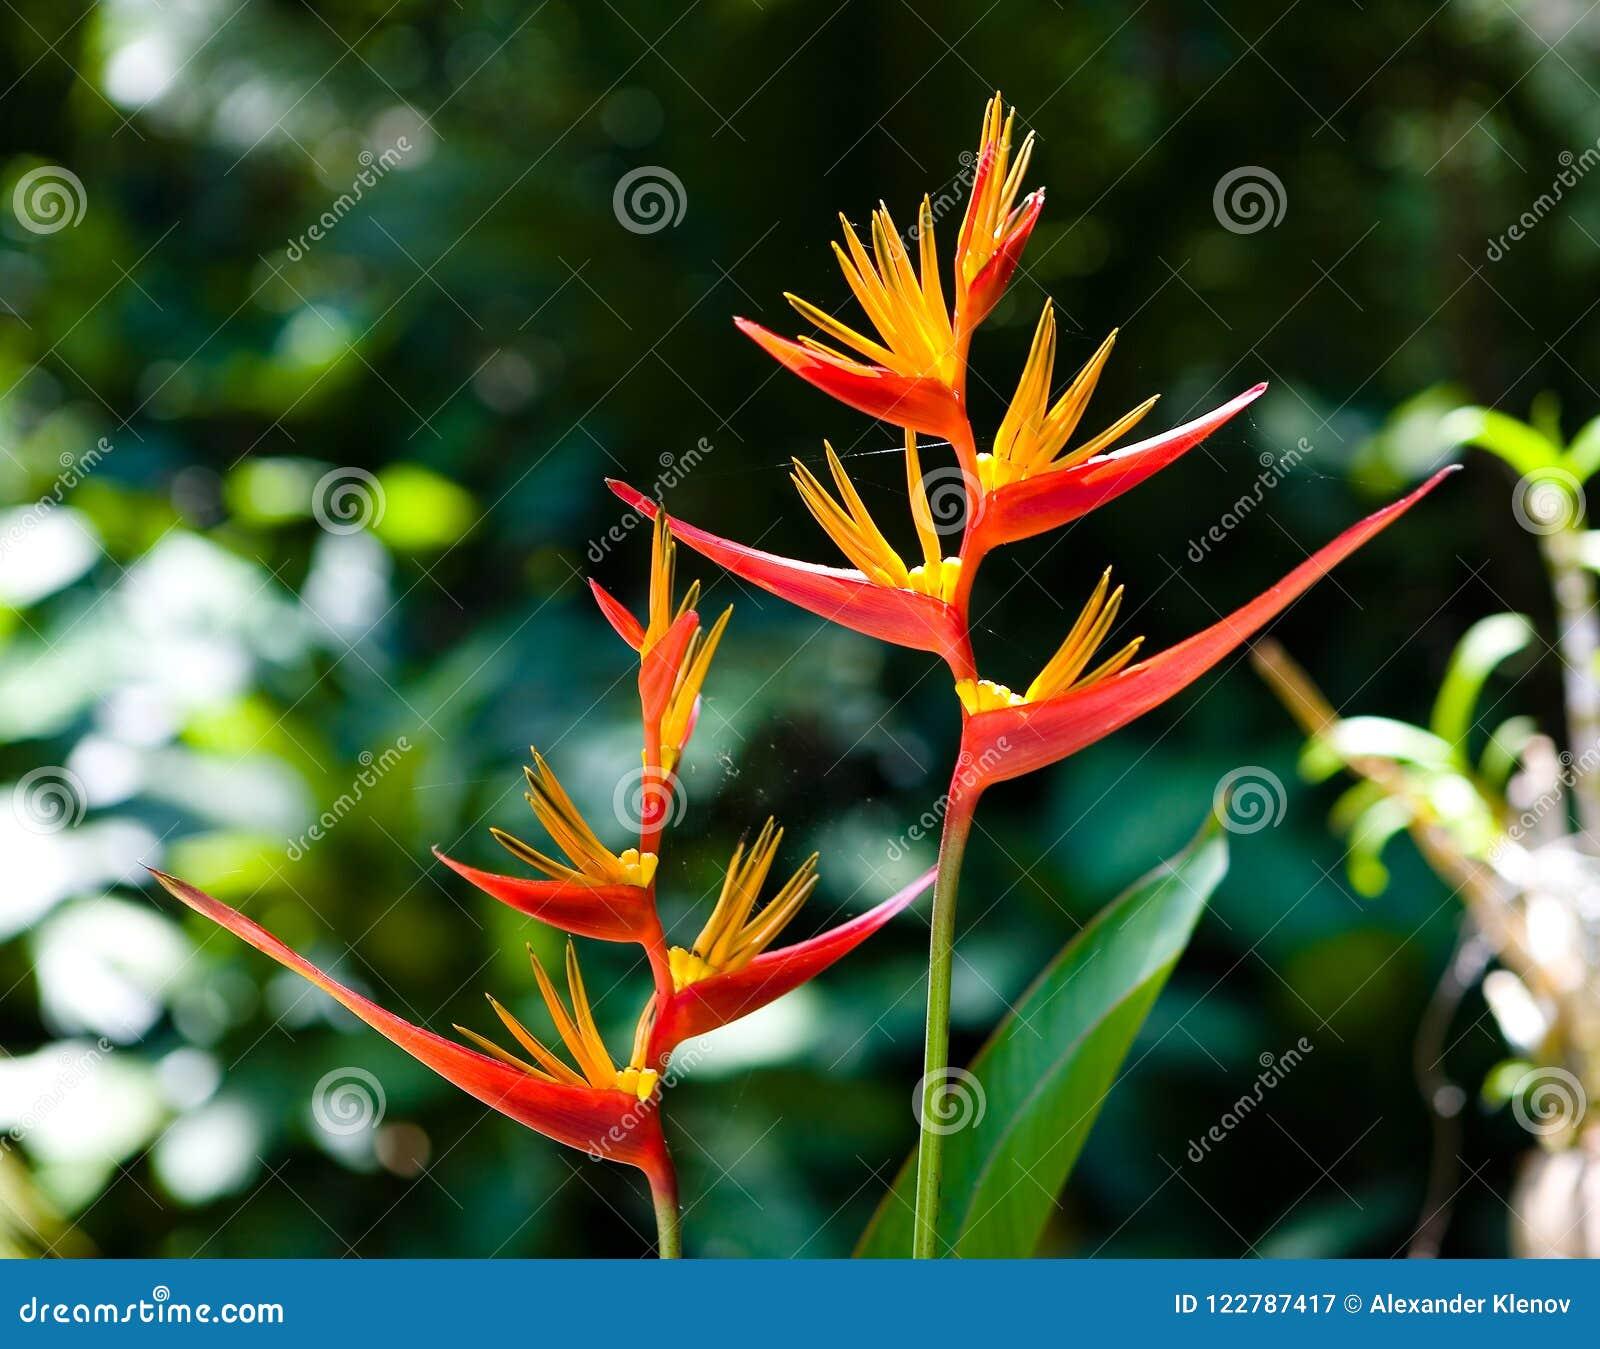 Beautiful exotic flowers and cobwebs on them stock image image of beautiful exotic flowers and cobwebs on them izmirmasajfo